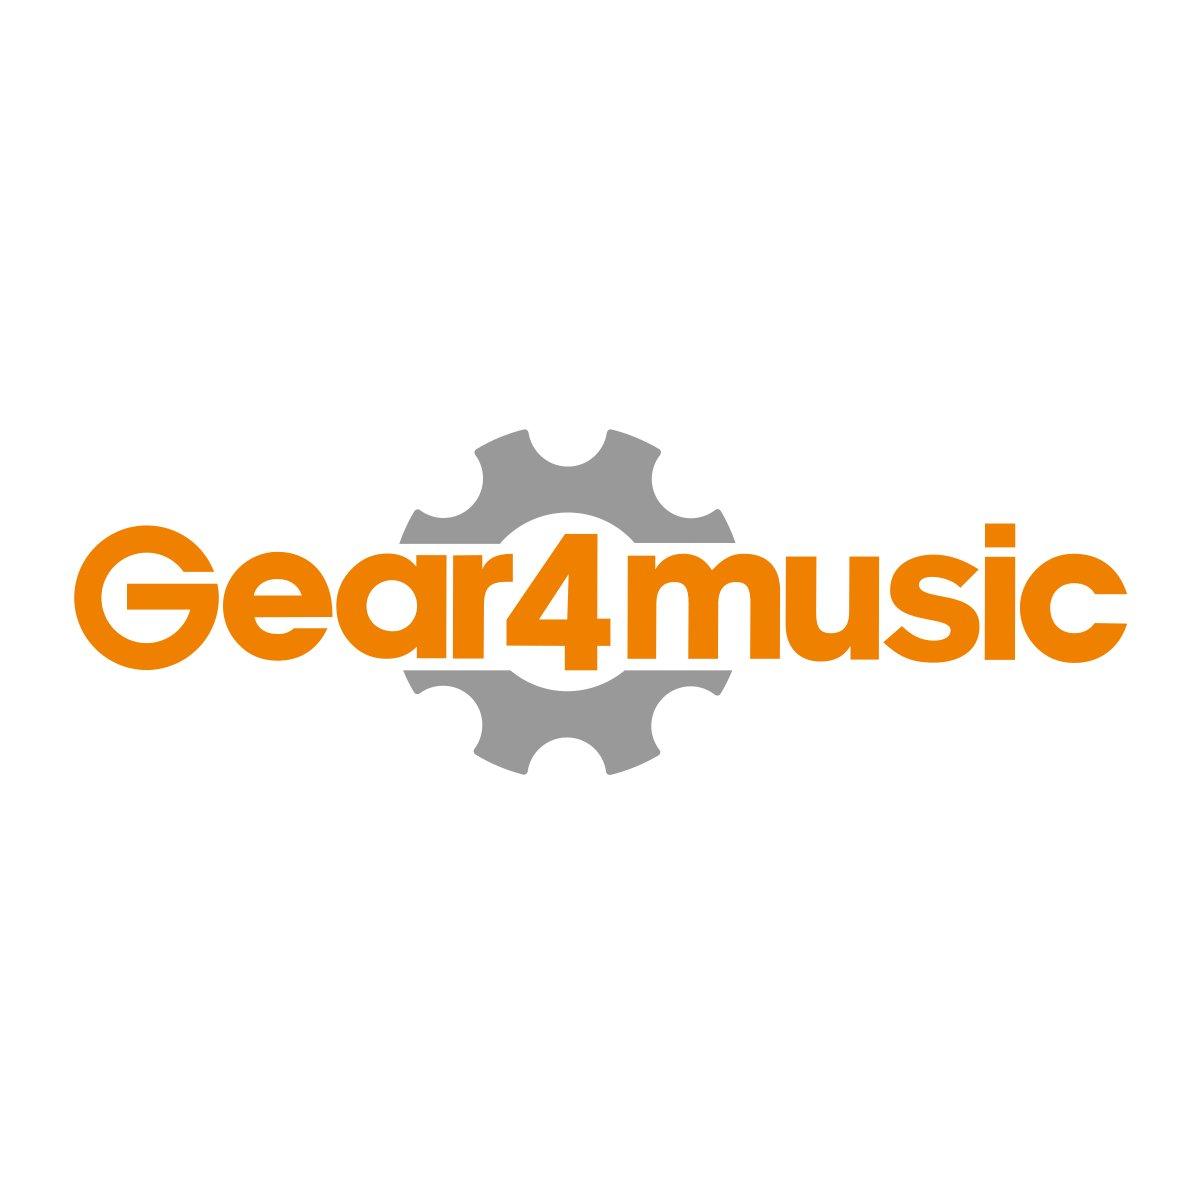 Flauta Deluxe de Gear4music + Pack de Accesorios